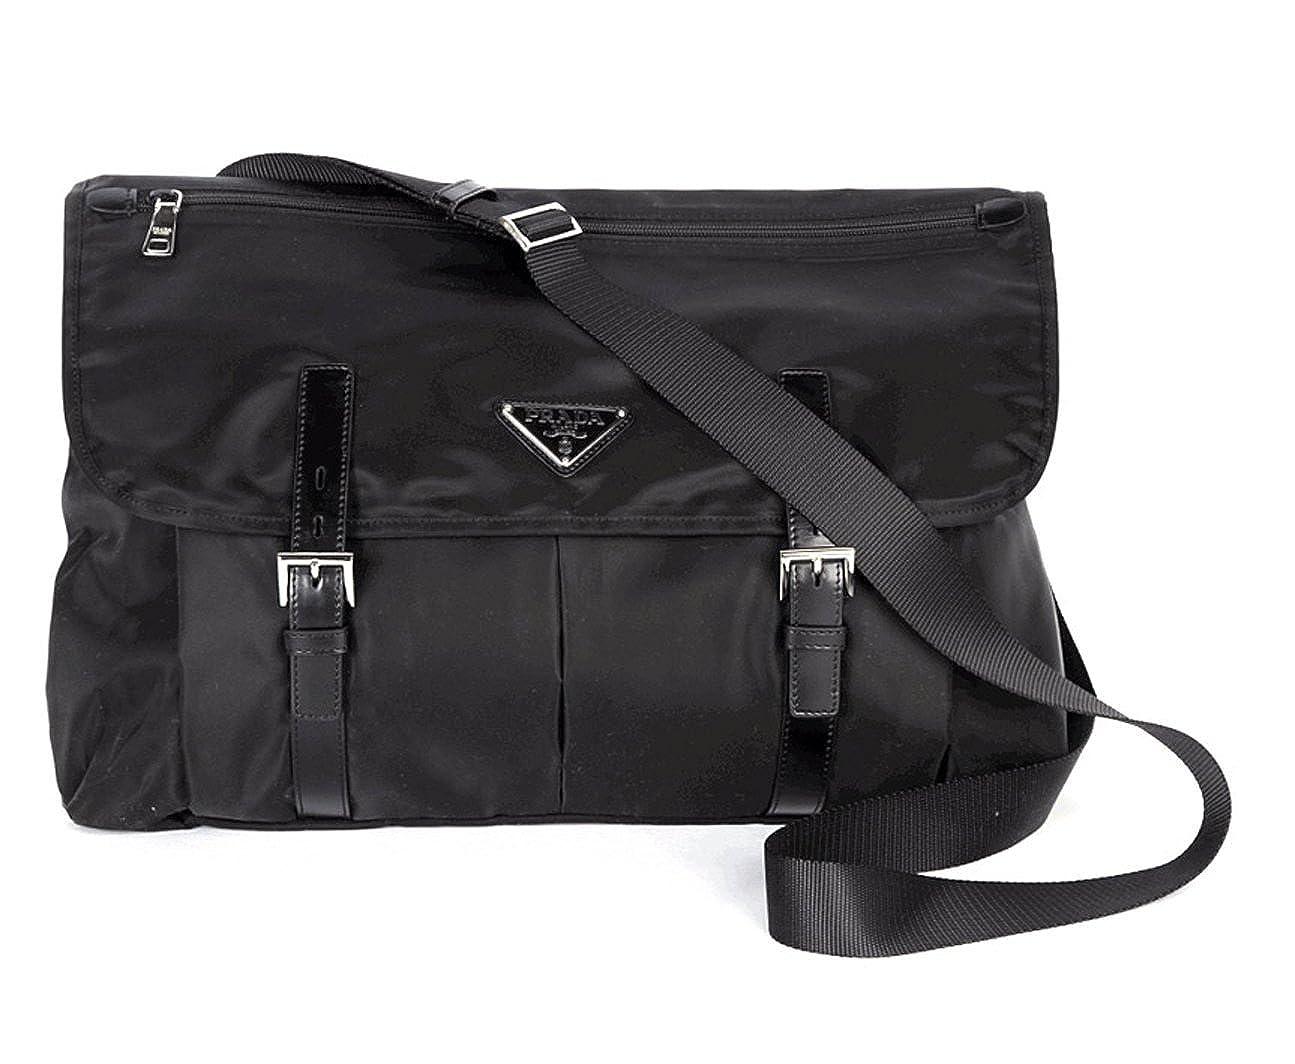 8a8666fceb2fae Prada Nylon Messenger Bag BT0696 Black: Amazon.co.uk: Shoes & Bags